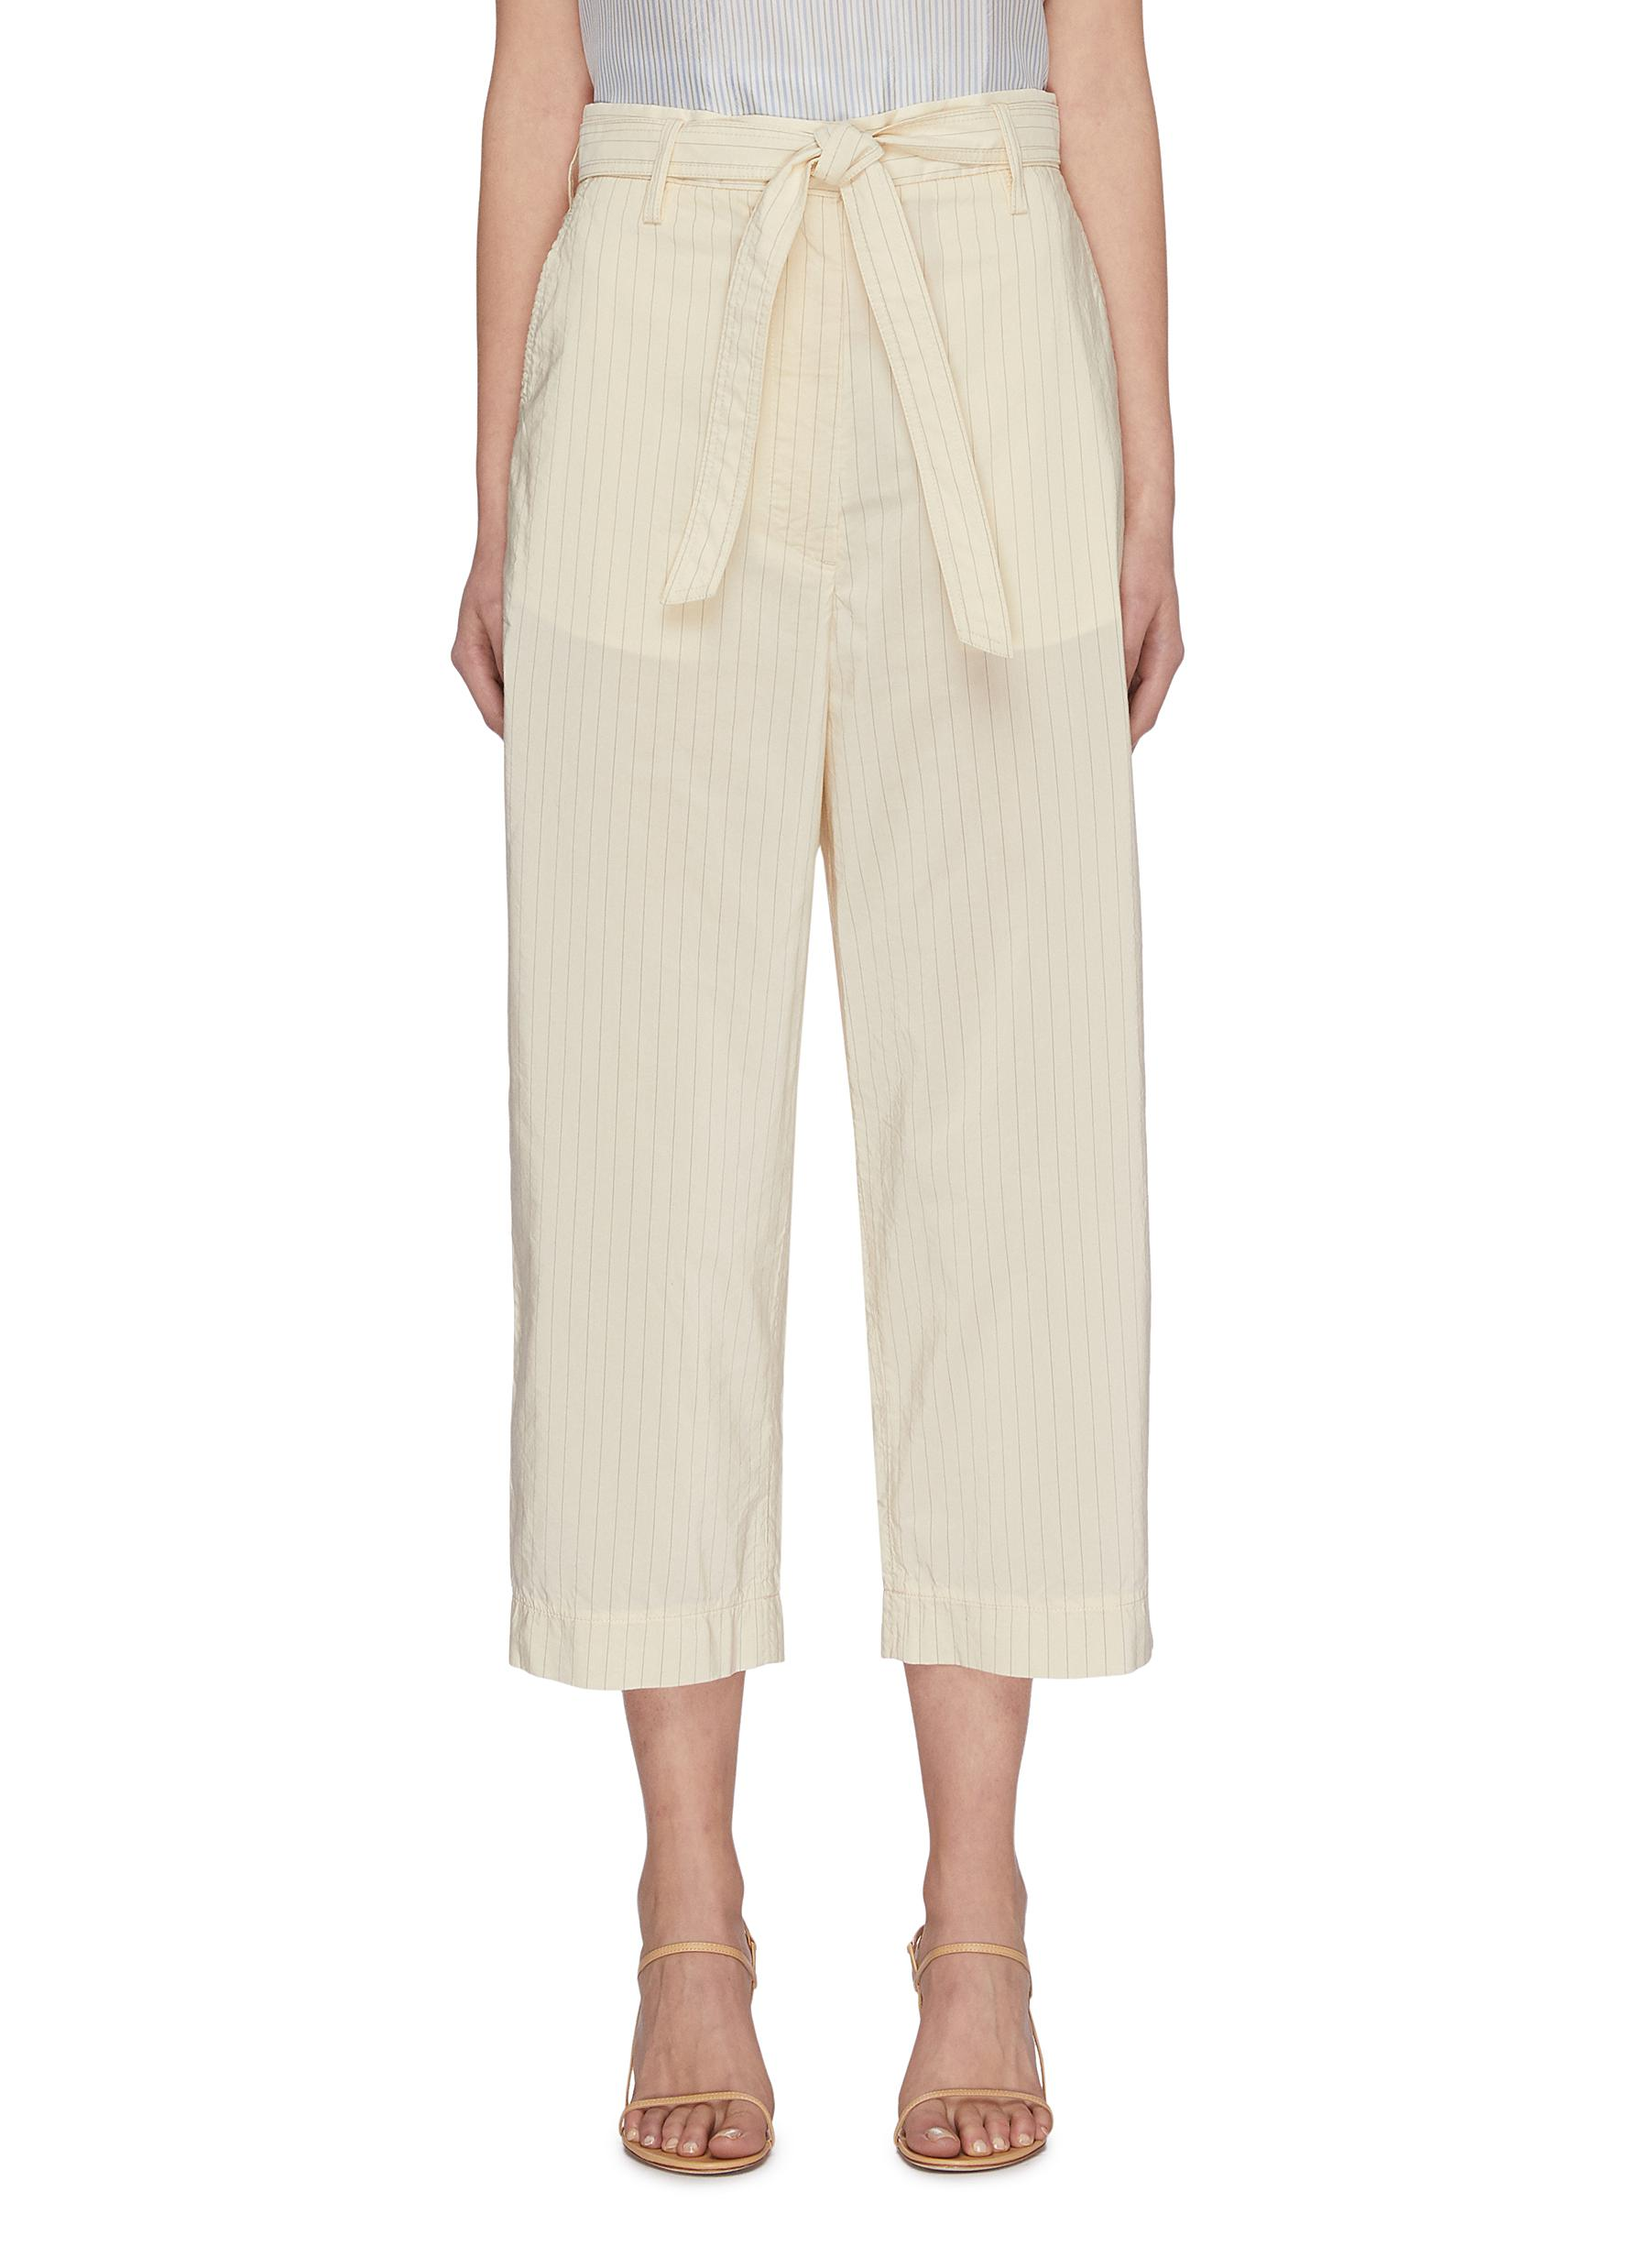 shop Barena 'Giuditta Gess Cupro' tie waist chino pants online